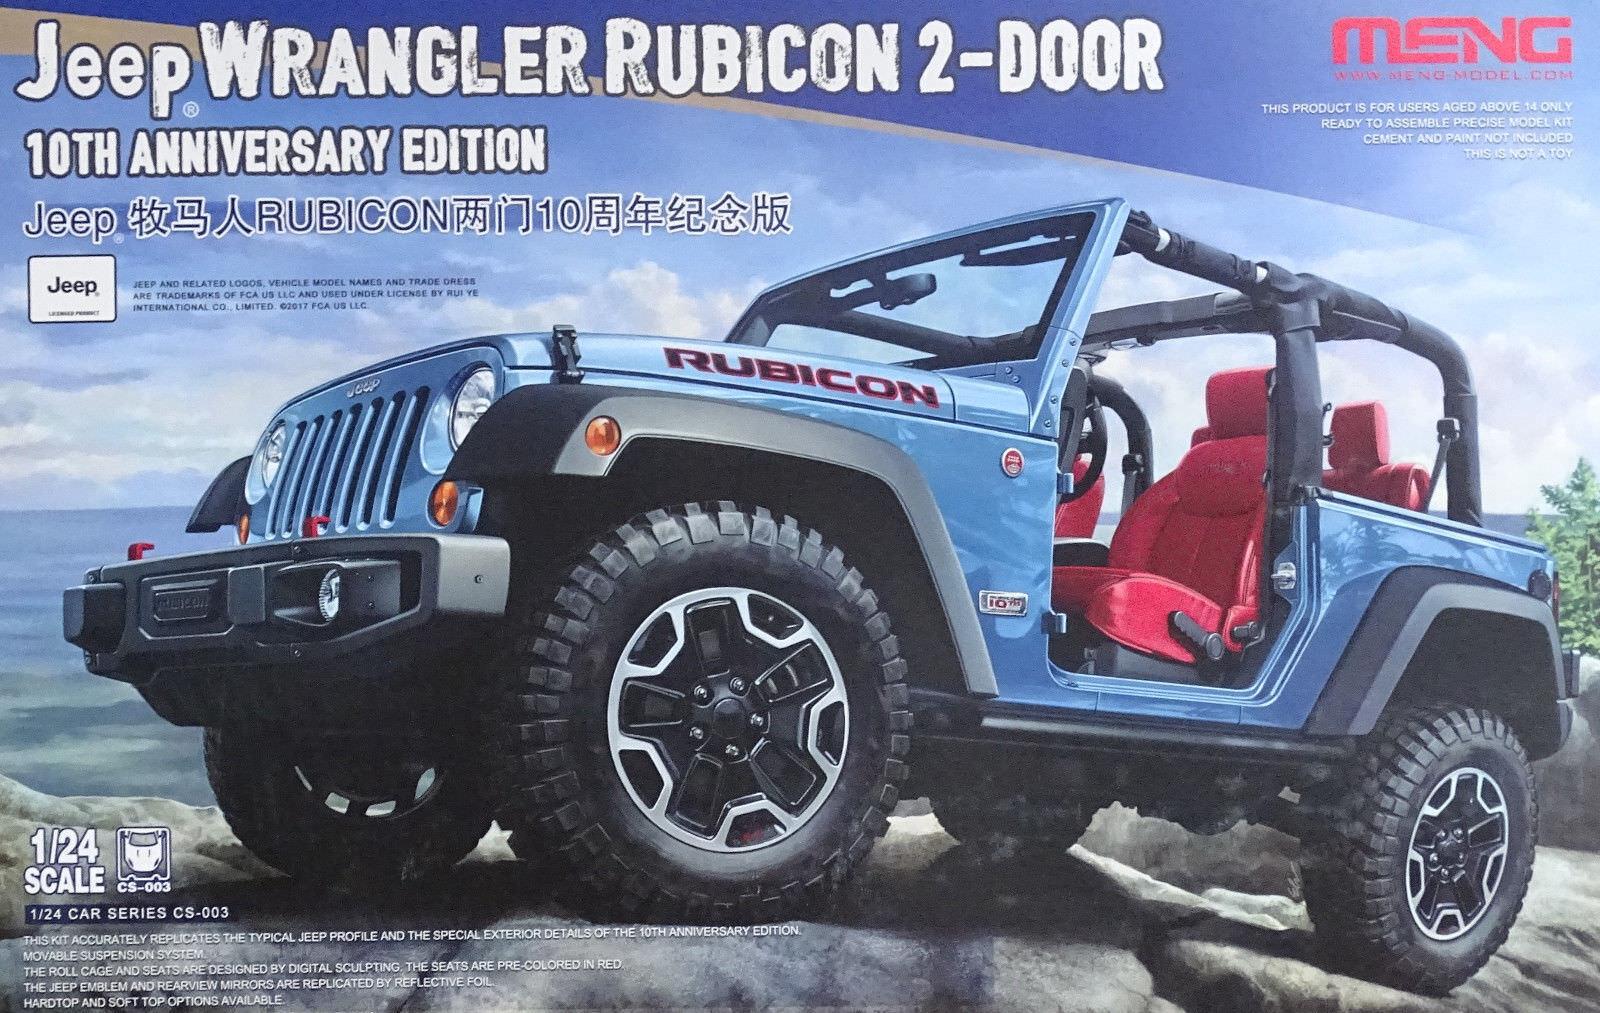 Hommesg 2013 Jeep Wrangler Rubicon 2-door 10th Anniversaire 1 24  Kit de Montage  distribution globale